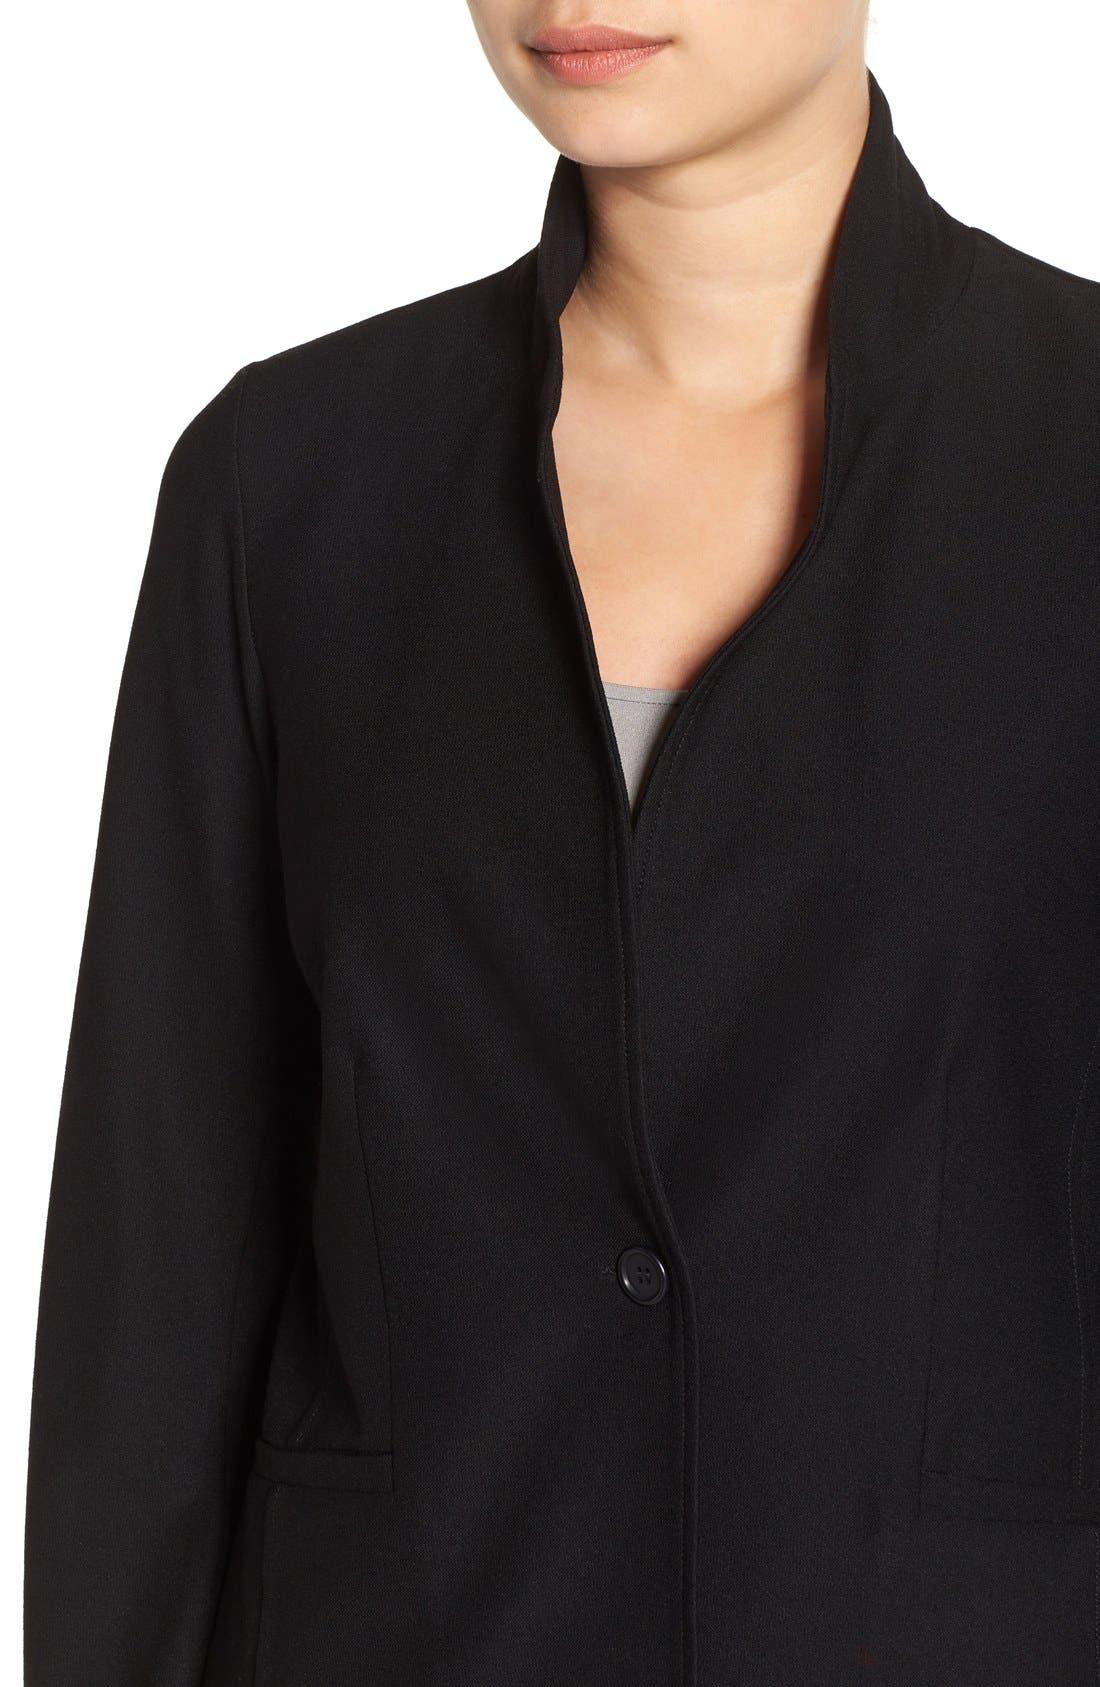 Washable Stretch Crepe Jacket,                             Alternate thumbnail 5, color,                             BLACK